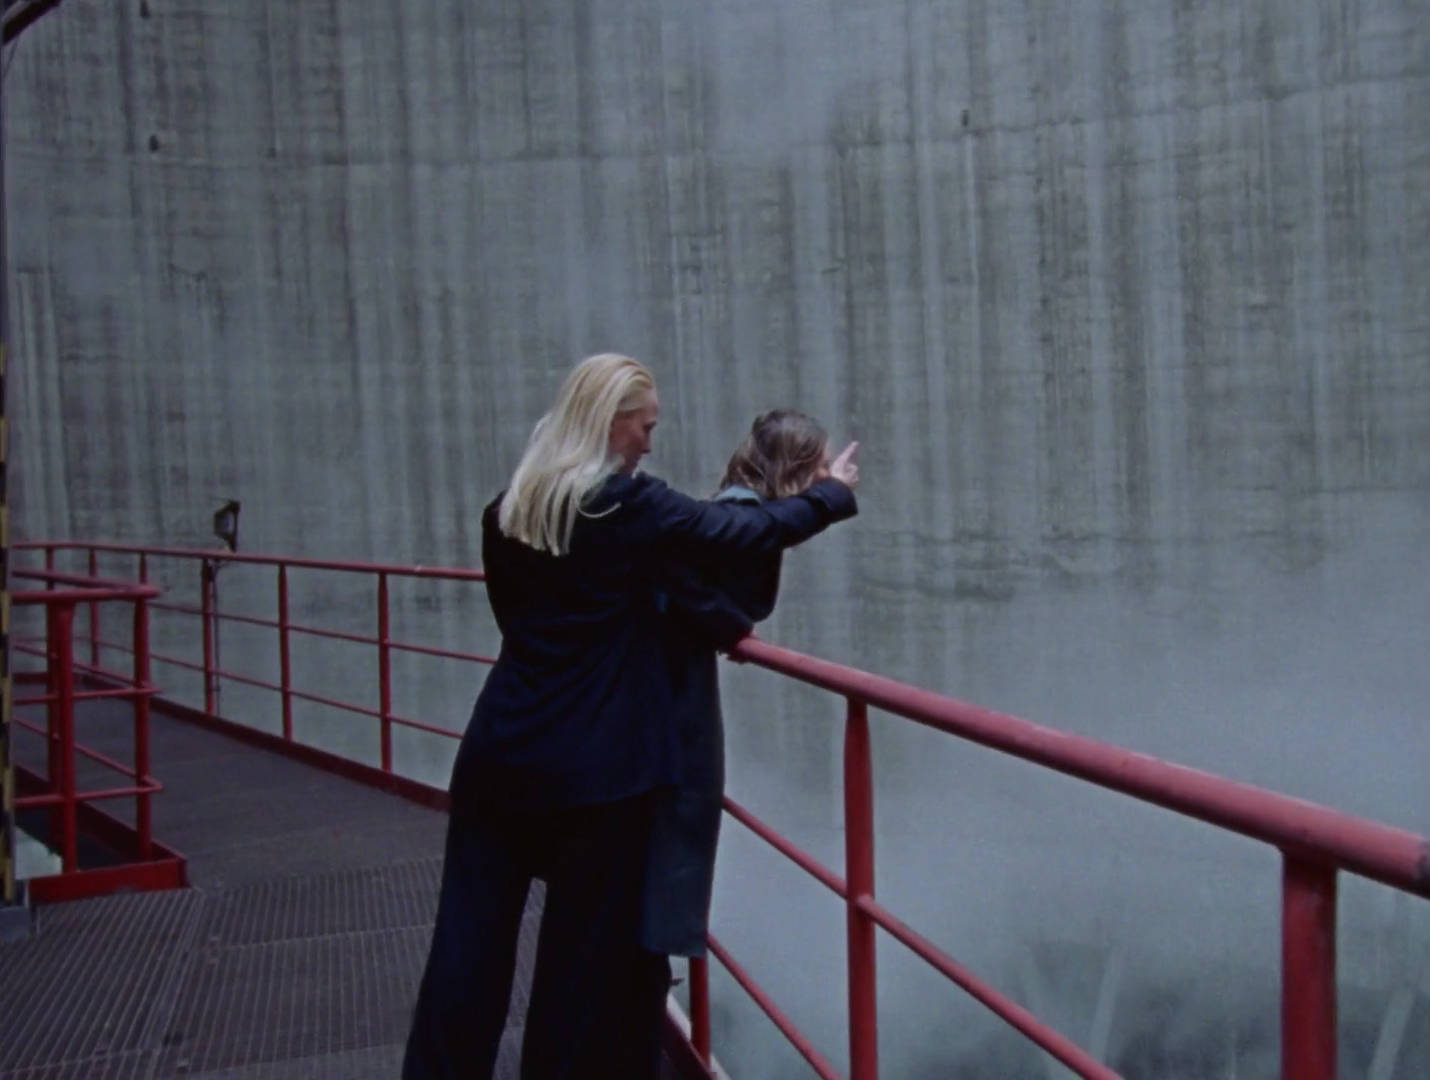 Image Source: Vimeo